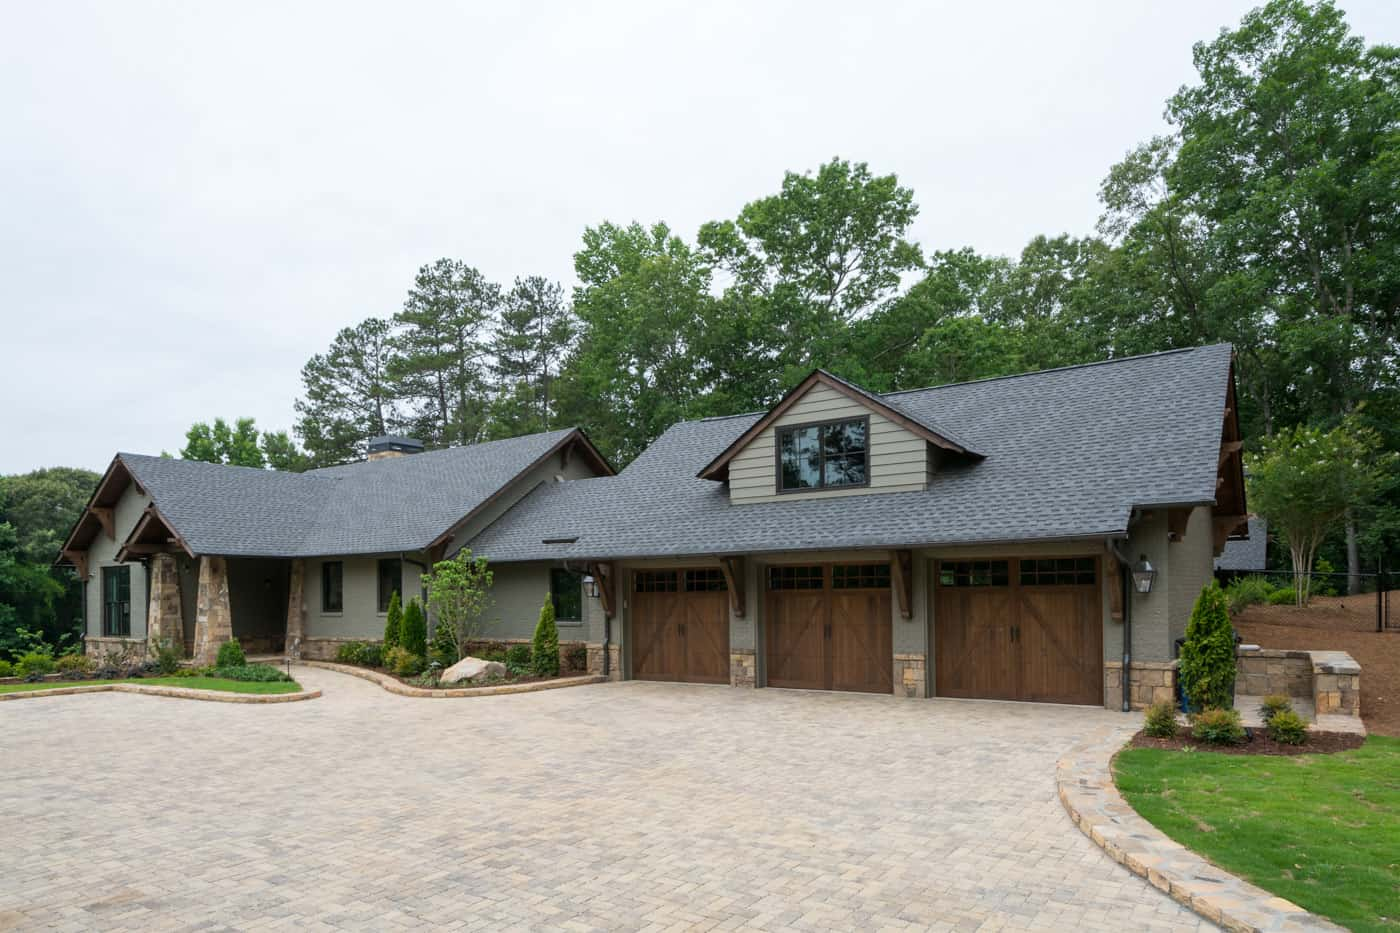 contemporary-ranch-style-home-exterior